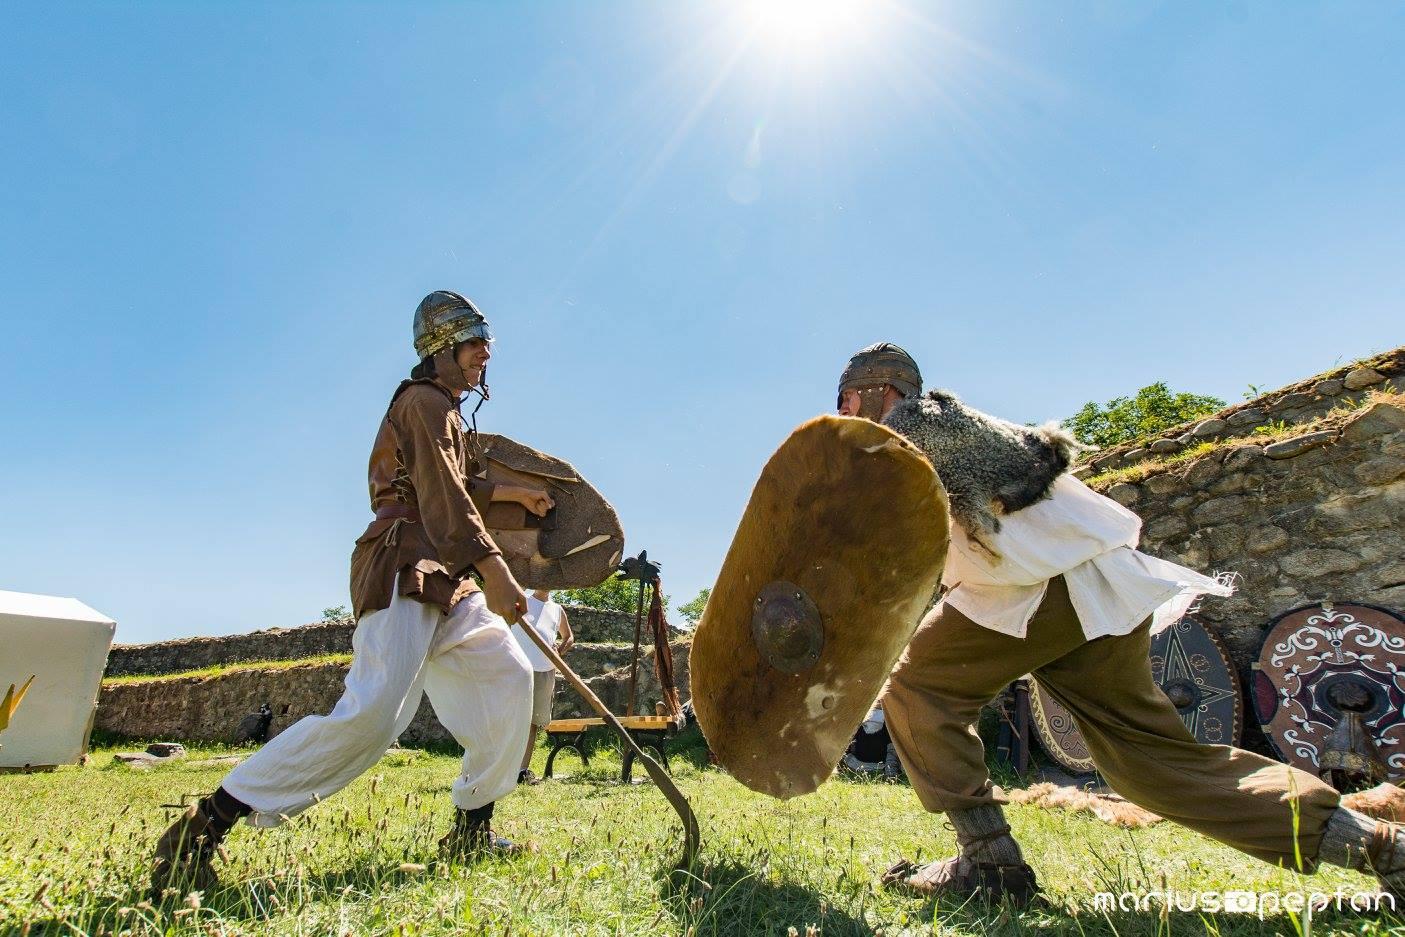 Roman Festival Dacia Felix – Under the sign of the eagle